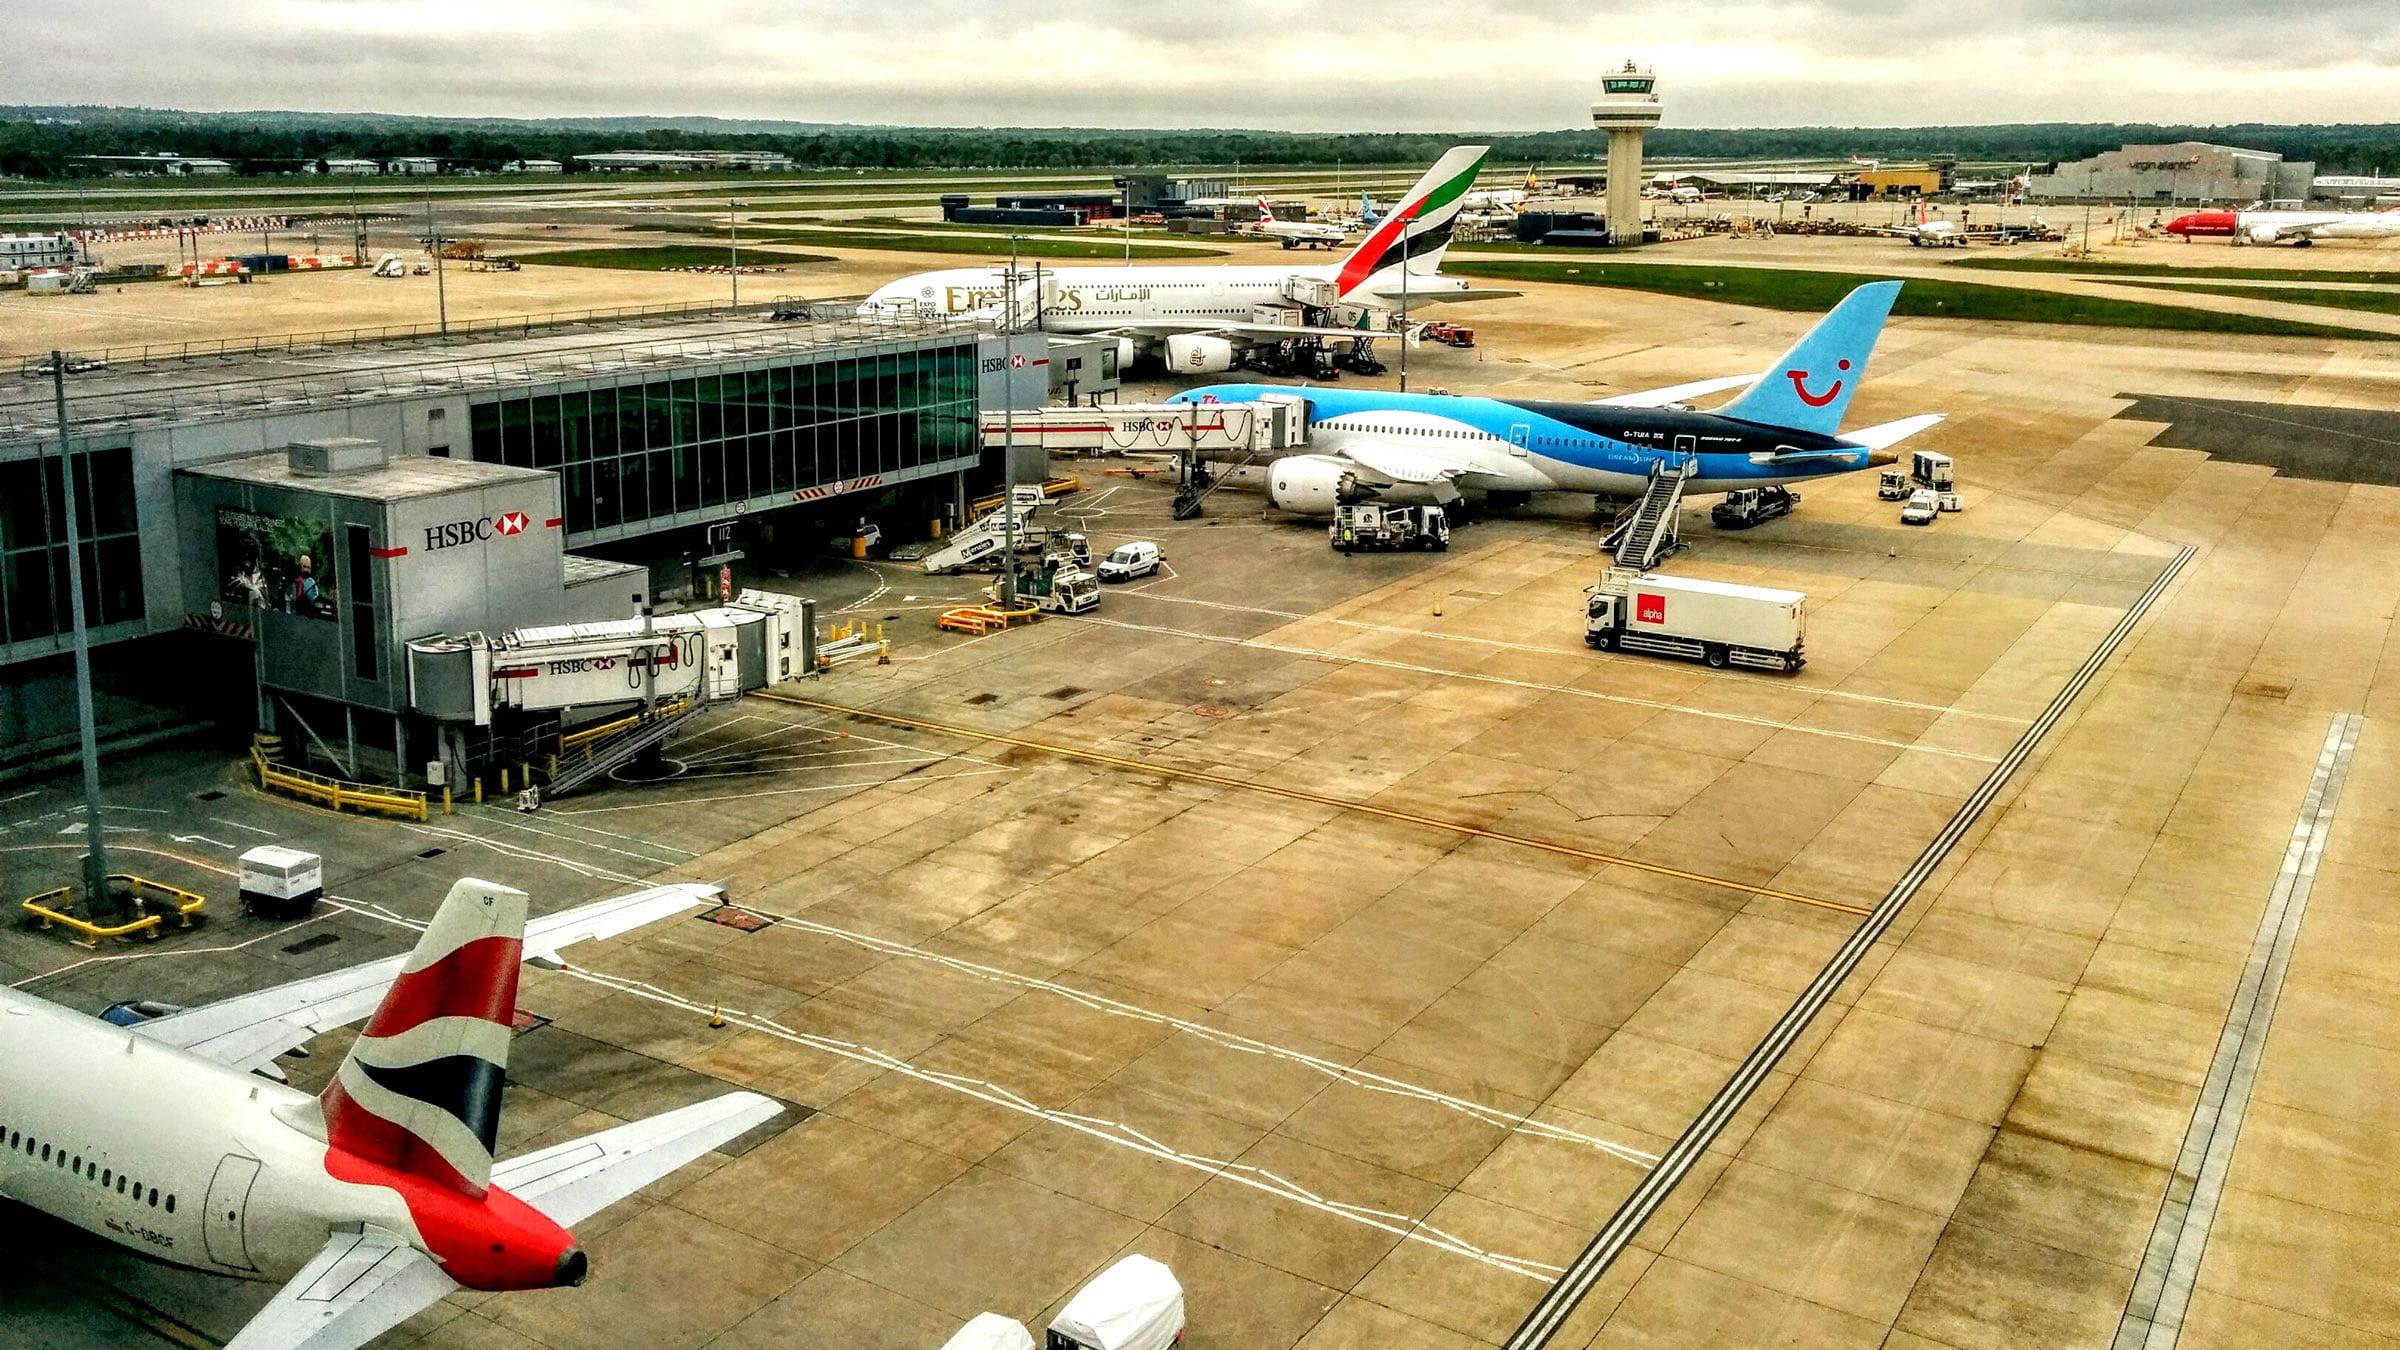 Aeropueto de Londres - Gatwick